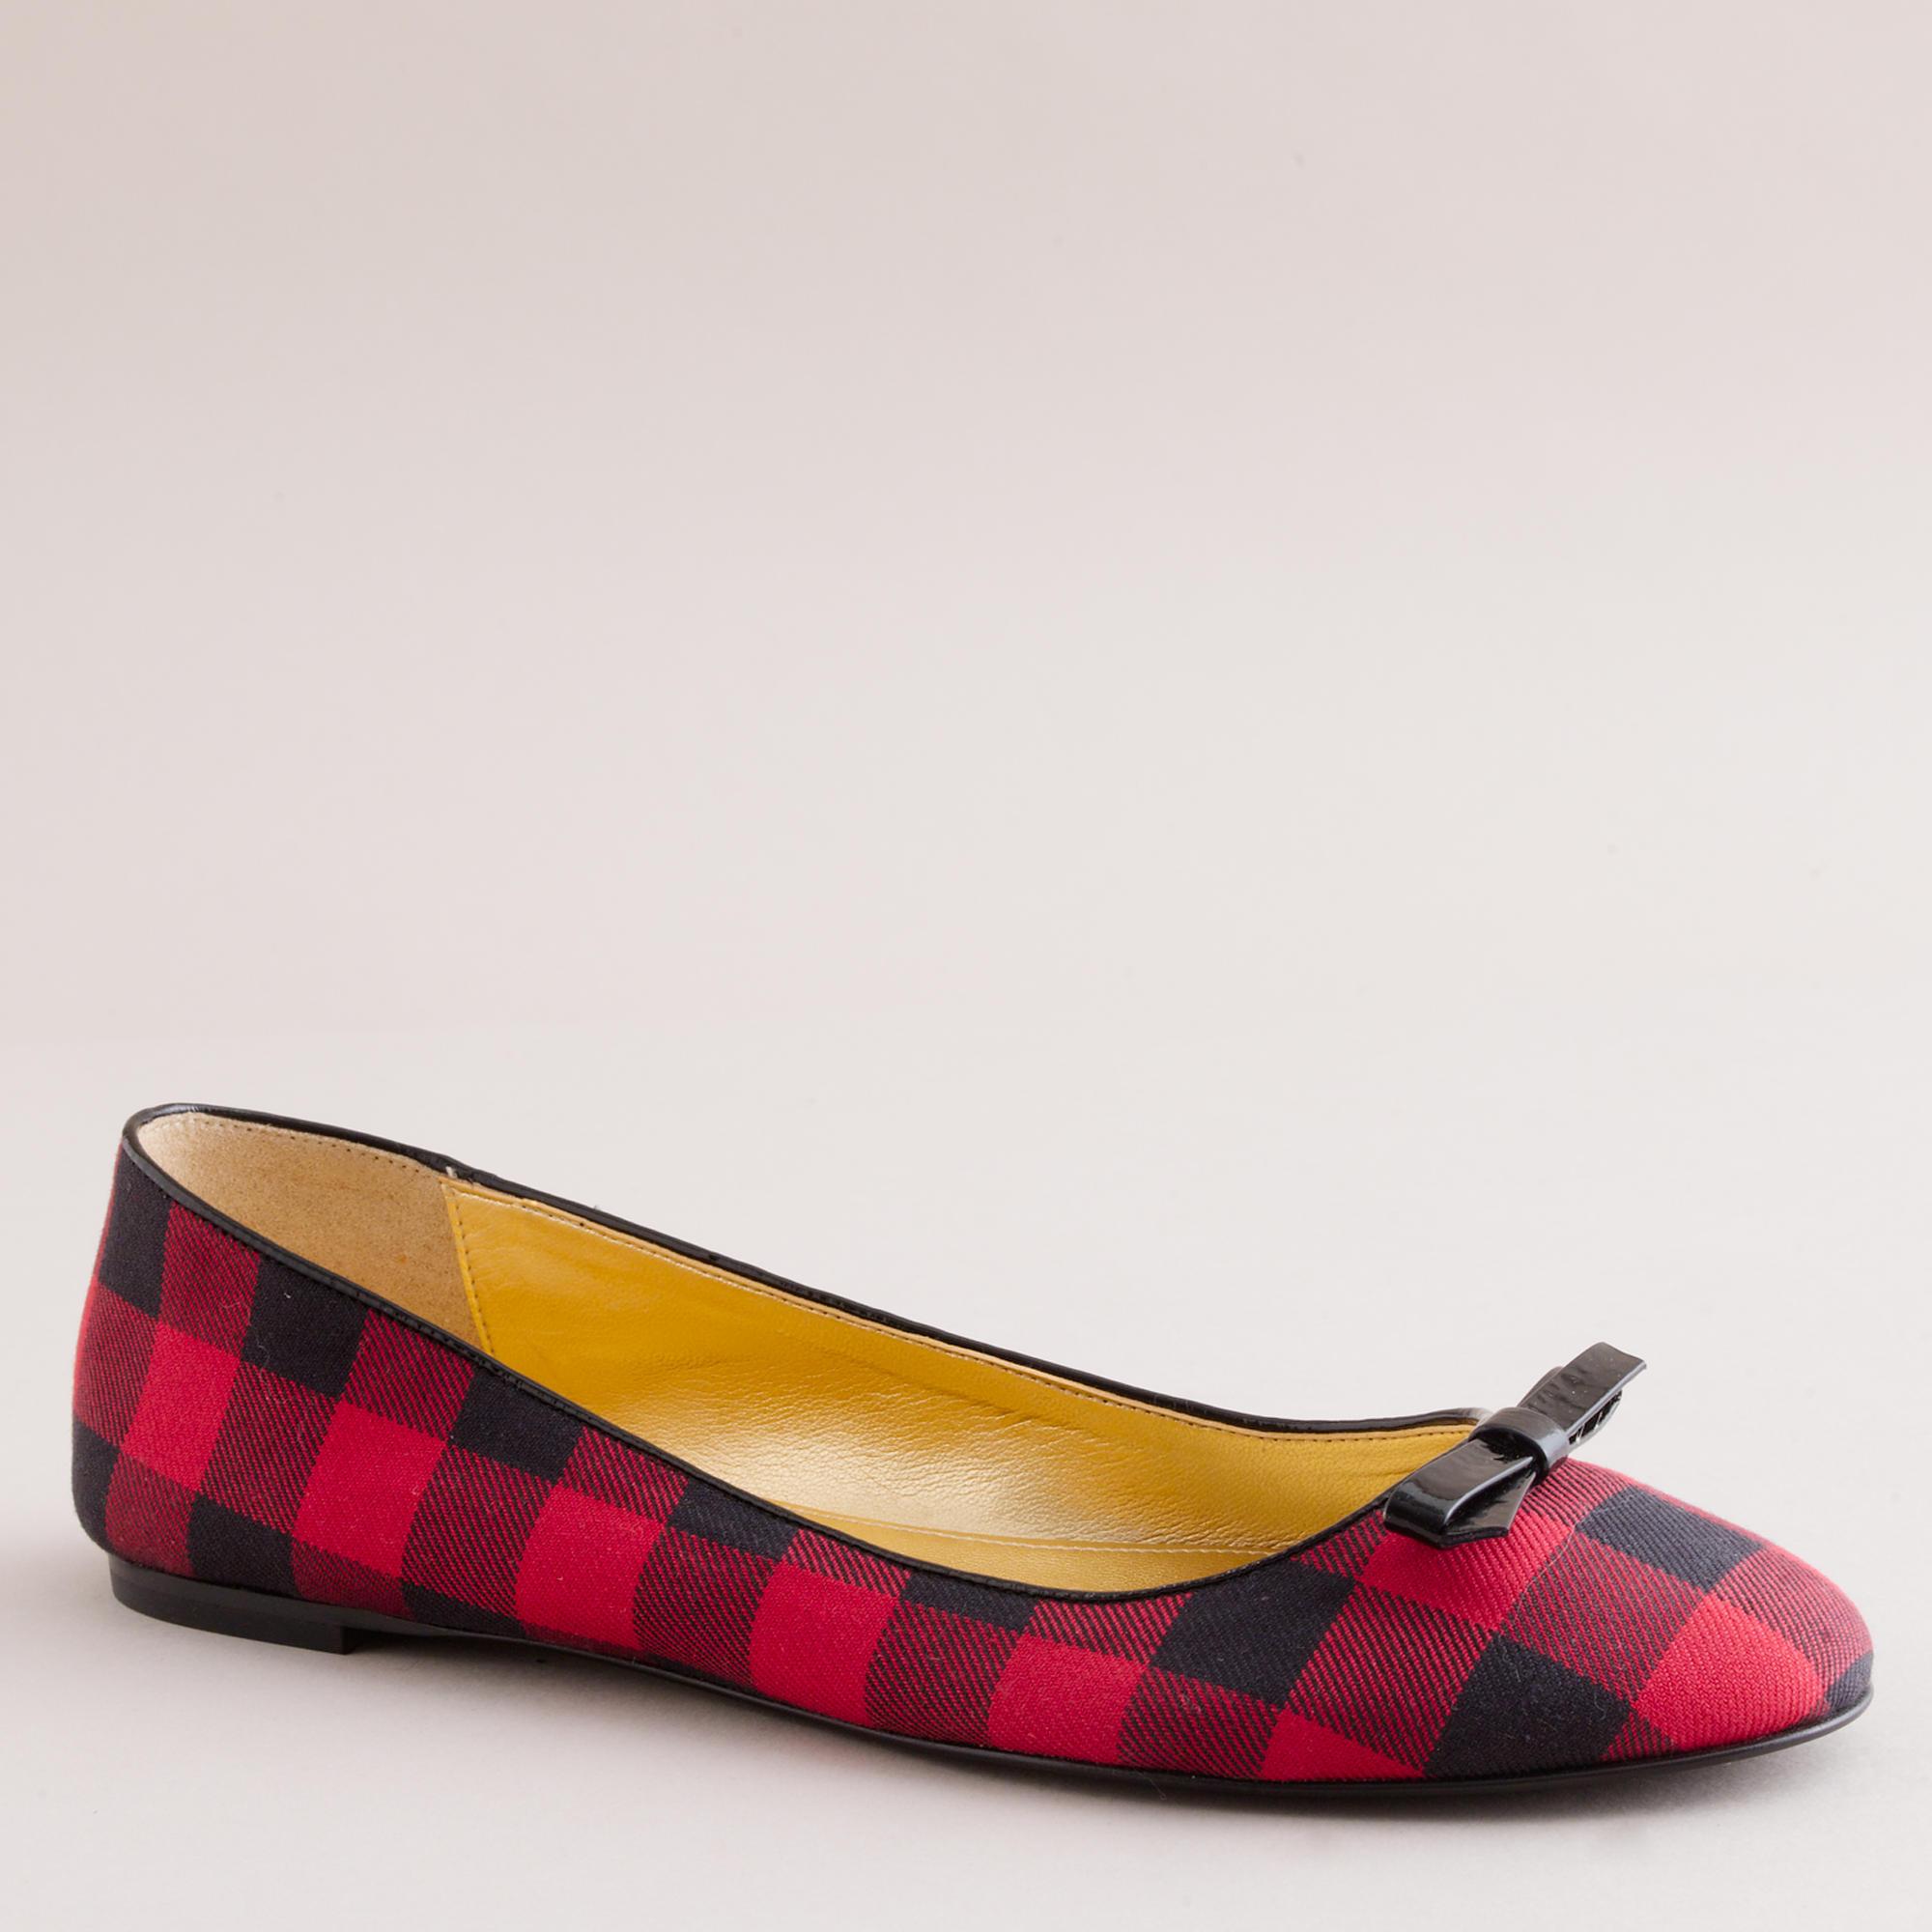 J Shoes On Sale